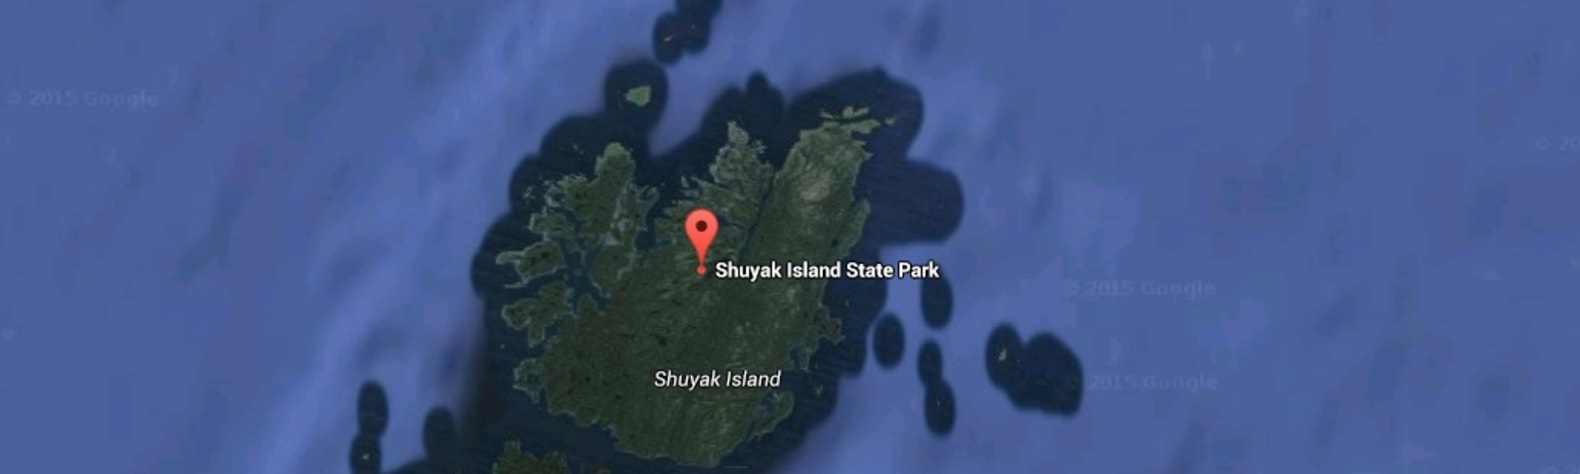 Shuyak Island State Park